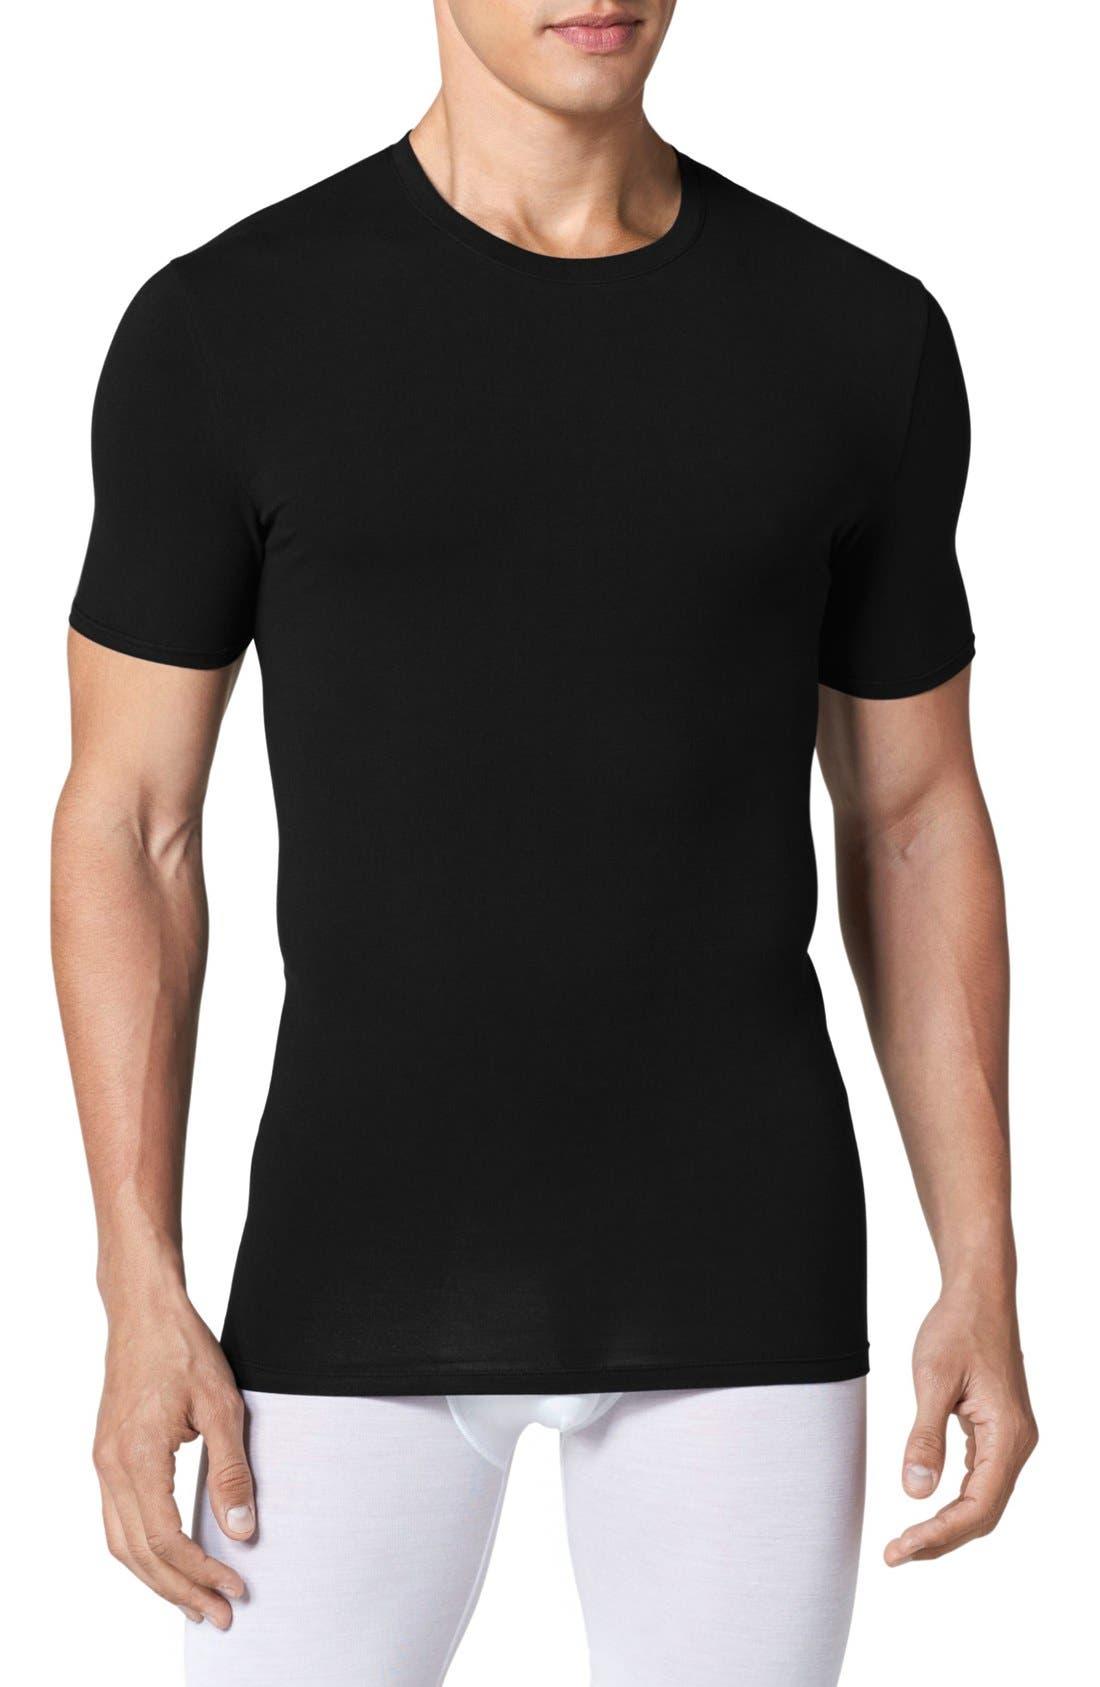 Tommy John 'Cool Cotton' Crewneck Undershirt